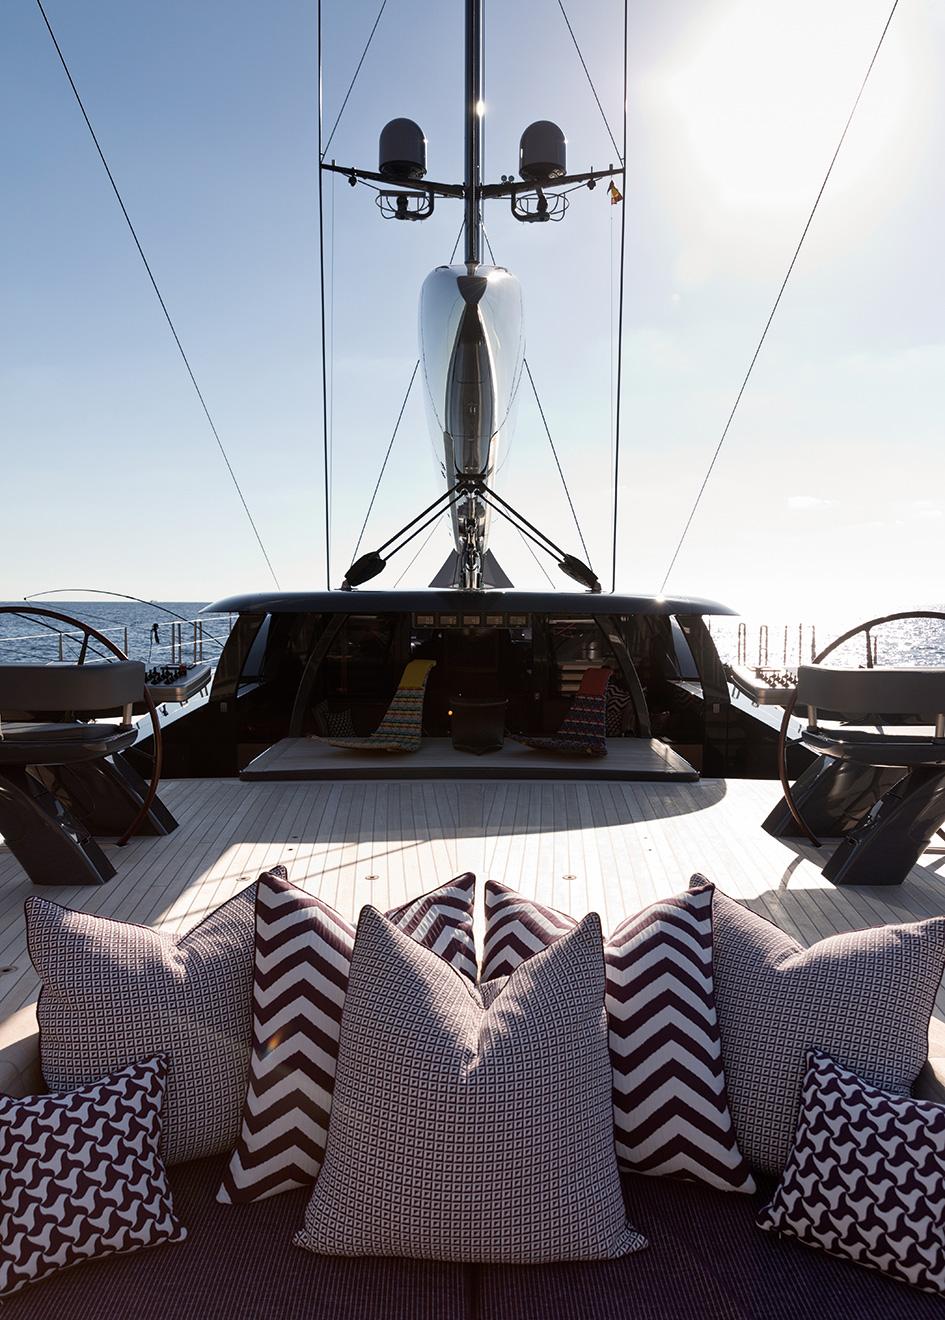 the-aft-deck-of-the-royal-huisman-sailing-yacht-ngoni-credit-jeff-brown-breed-media